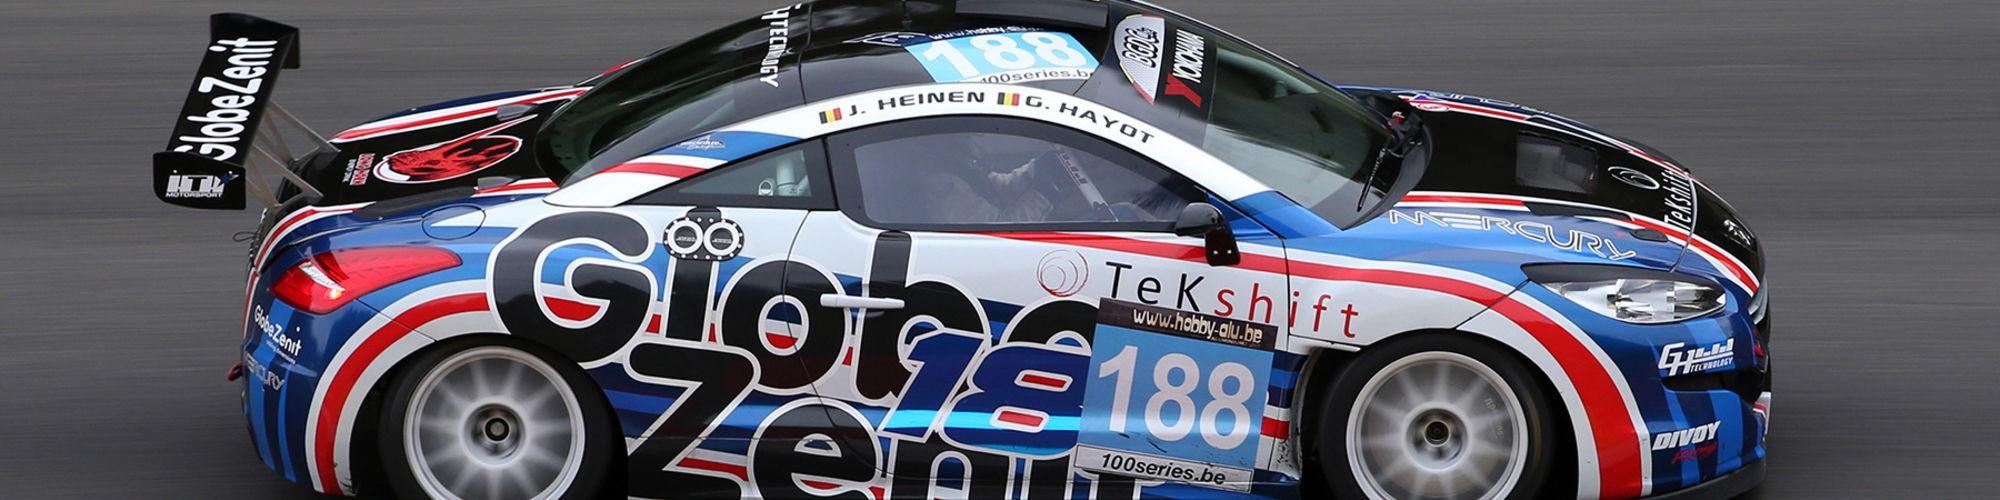 TeKshift GmbH  cover image